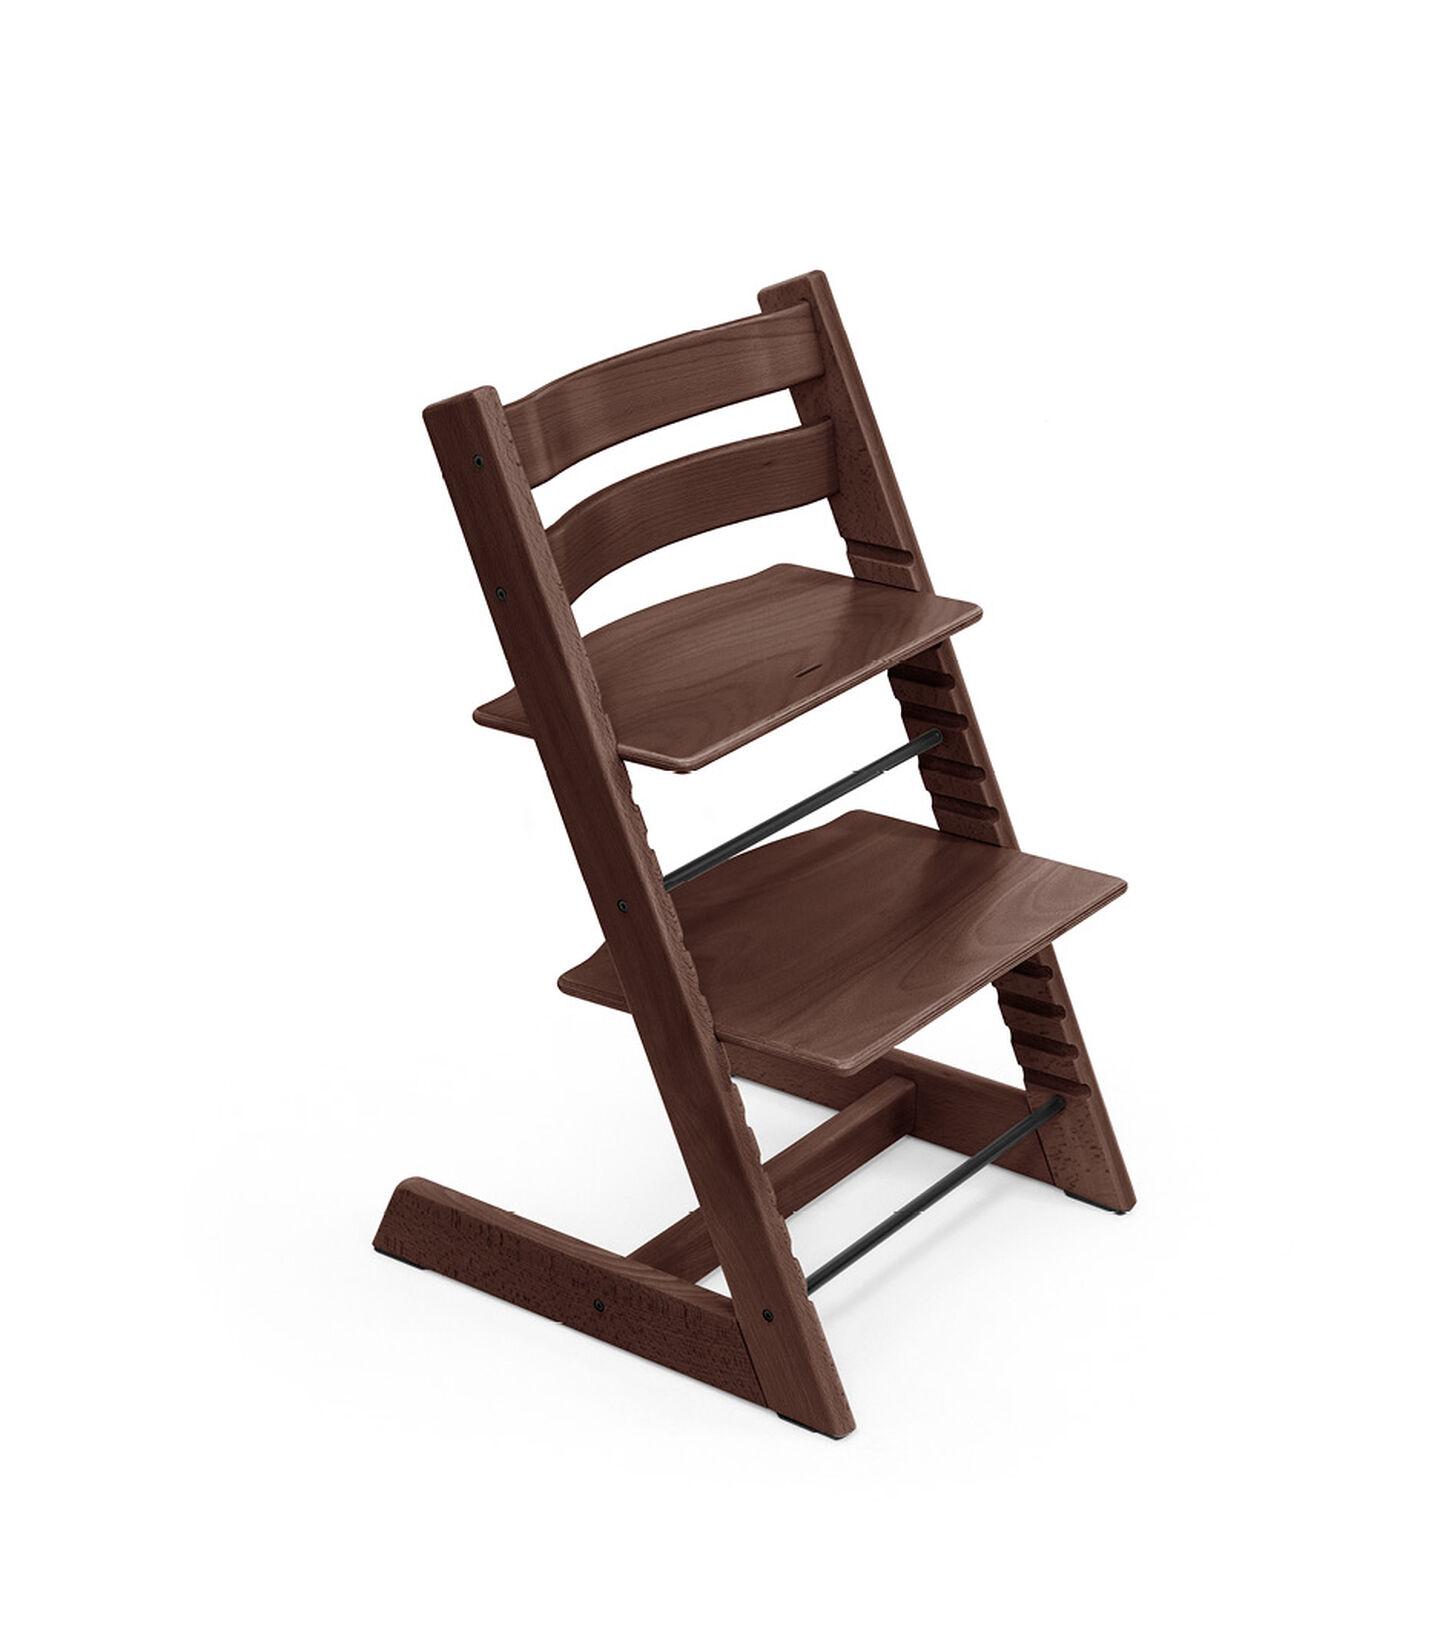 Tripp Trapp® chair Walnut Brown, Beech Wood. view 1